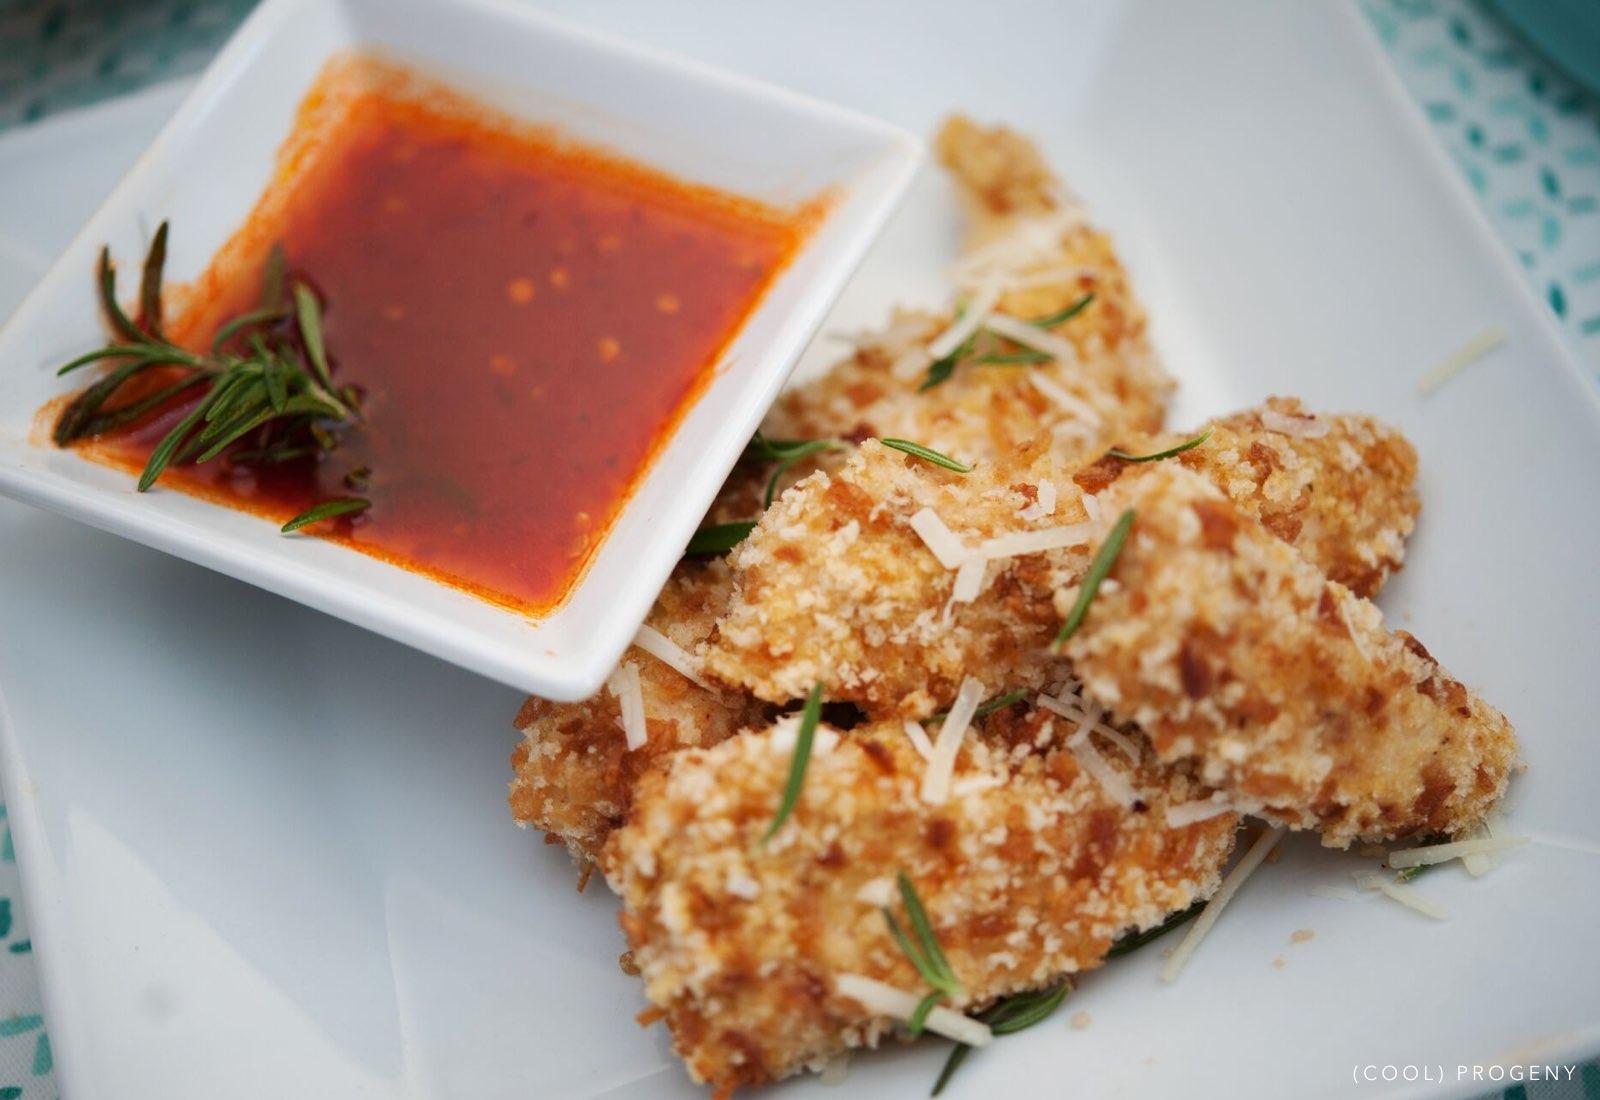 snow day snacks: crispy onion chicken strips - (cool) progeny